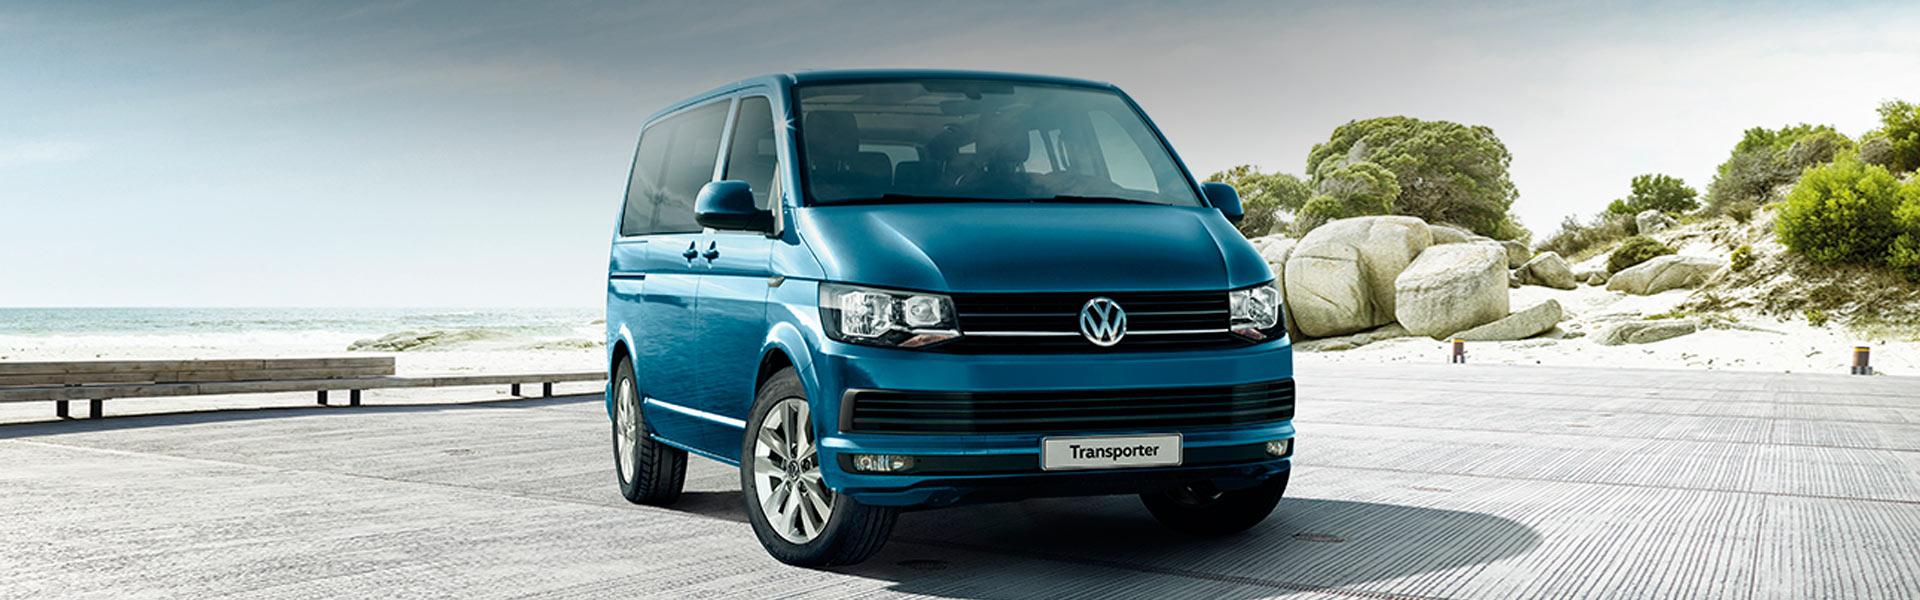 Сервис Volkswagen Transporter